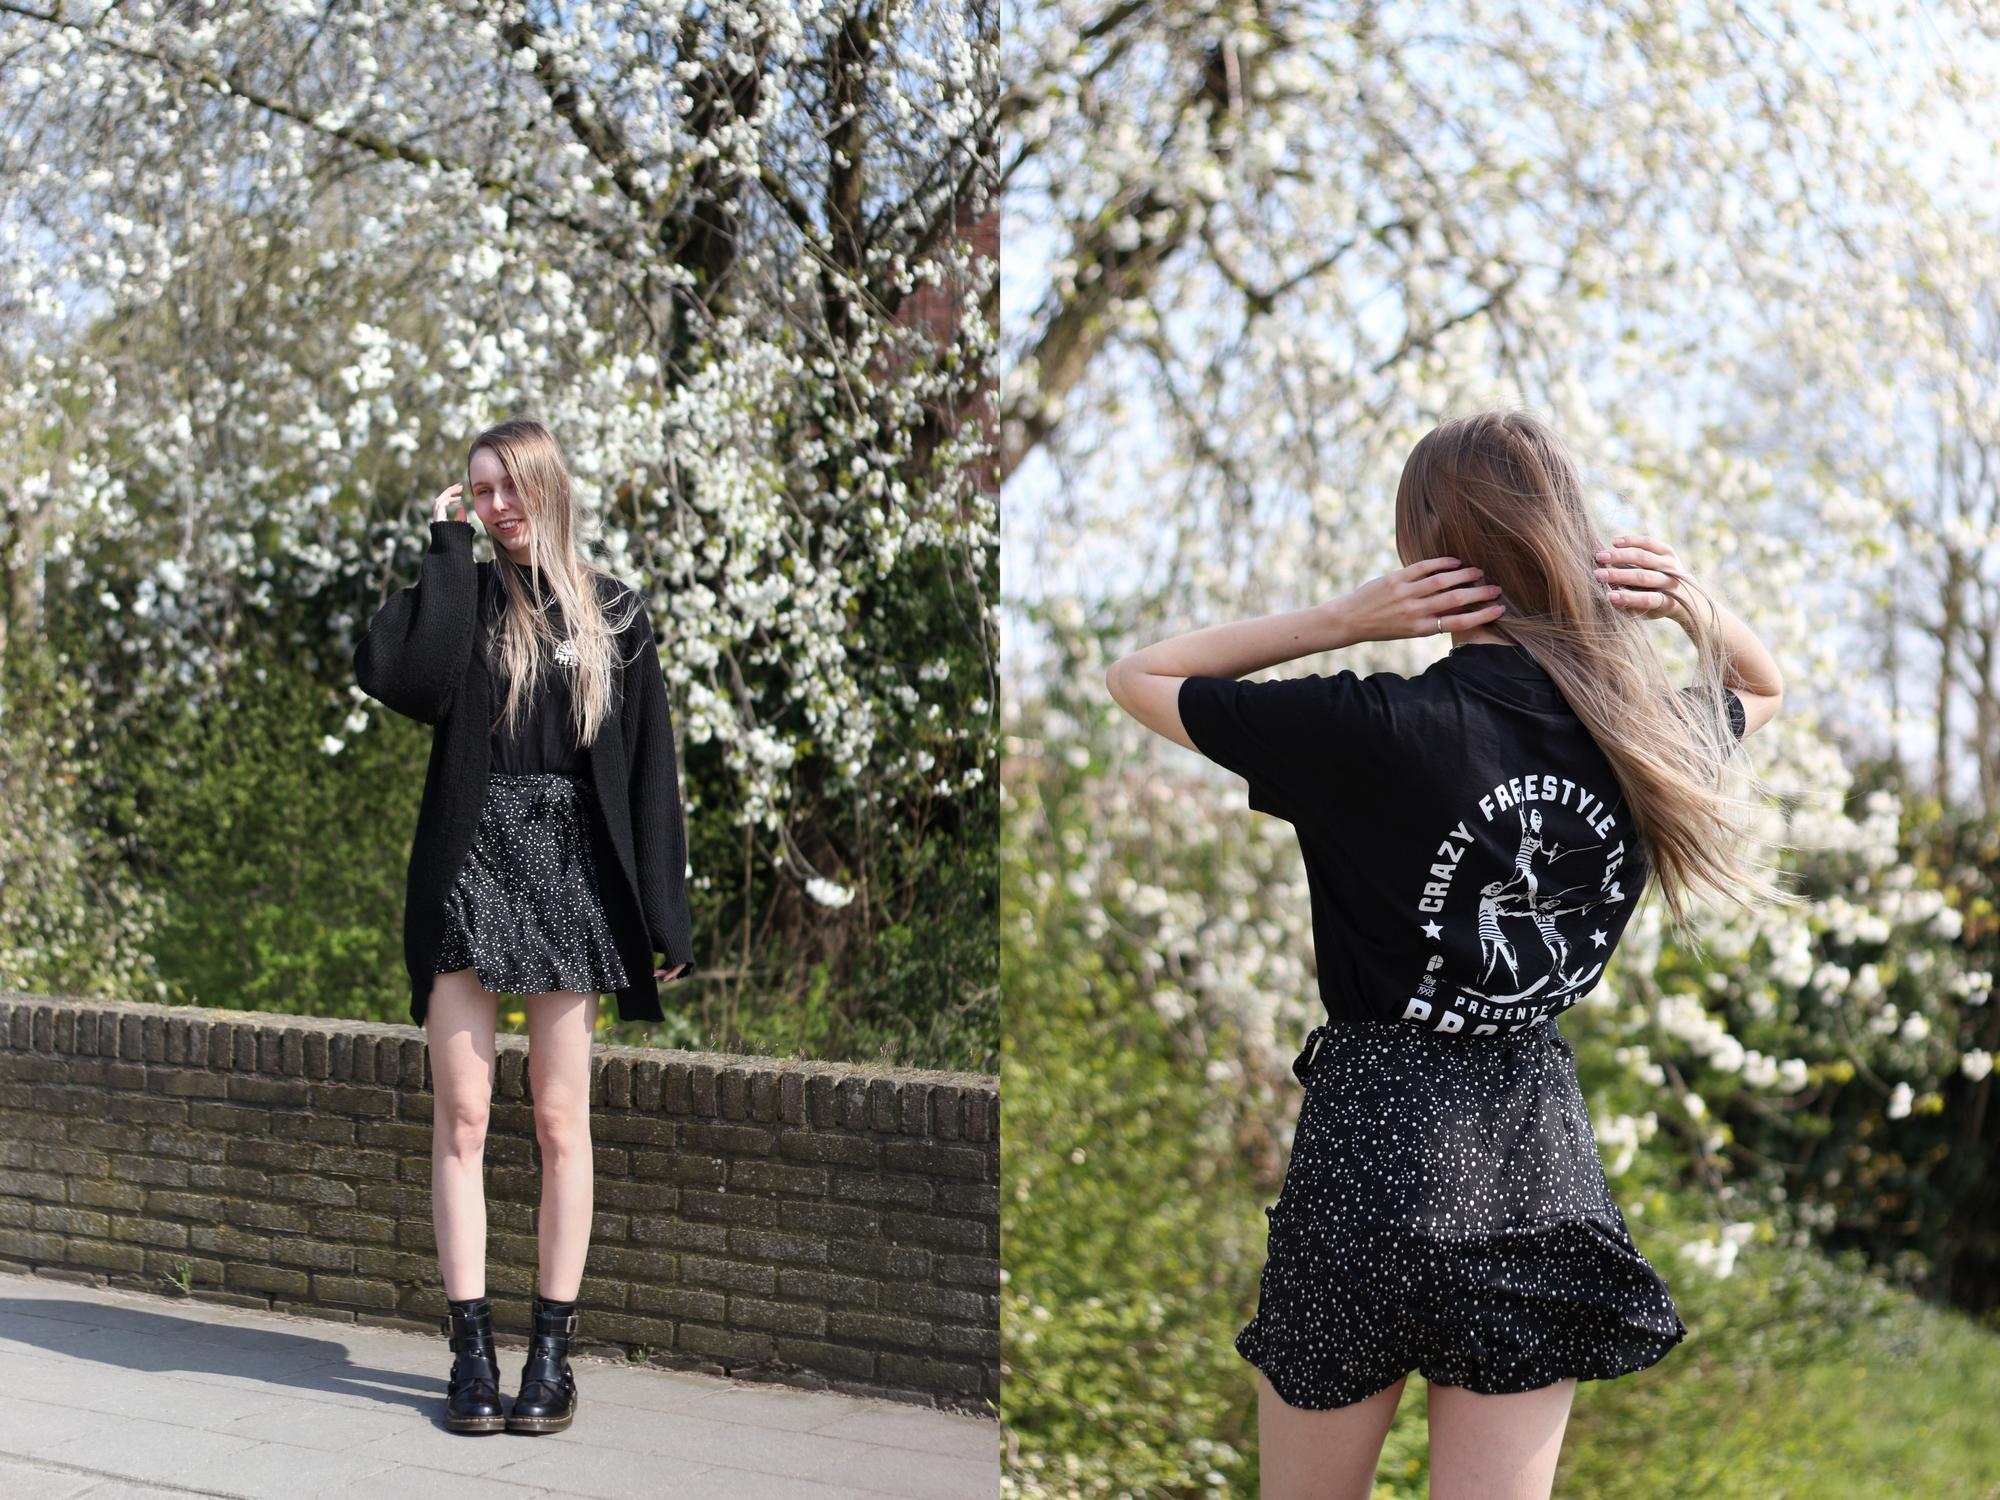 Nederlandse mode blogger zwarte outfit zomer Protest sportswear streetwear broekrokje skort shirt met print op rug Dr Martens Blake II bloesem fotoshoot